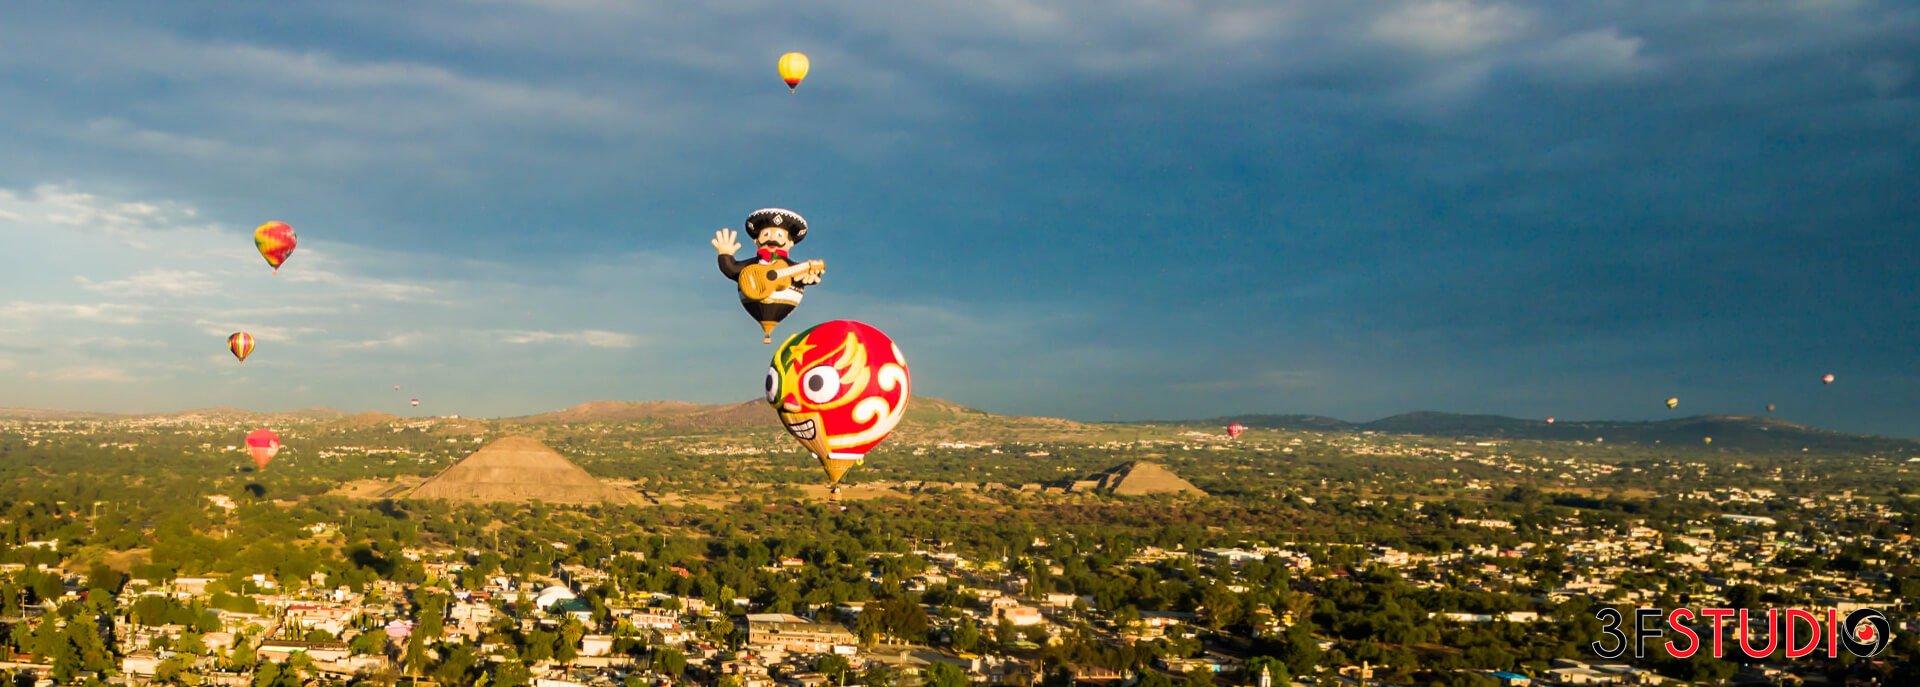 Vuelo en Globo Tradicional en Teotihuacán